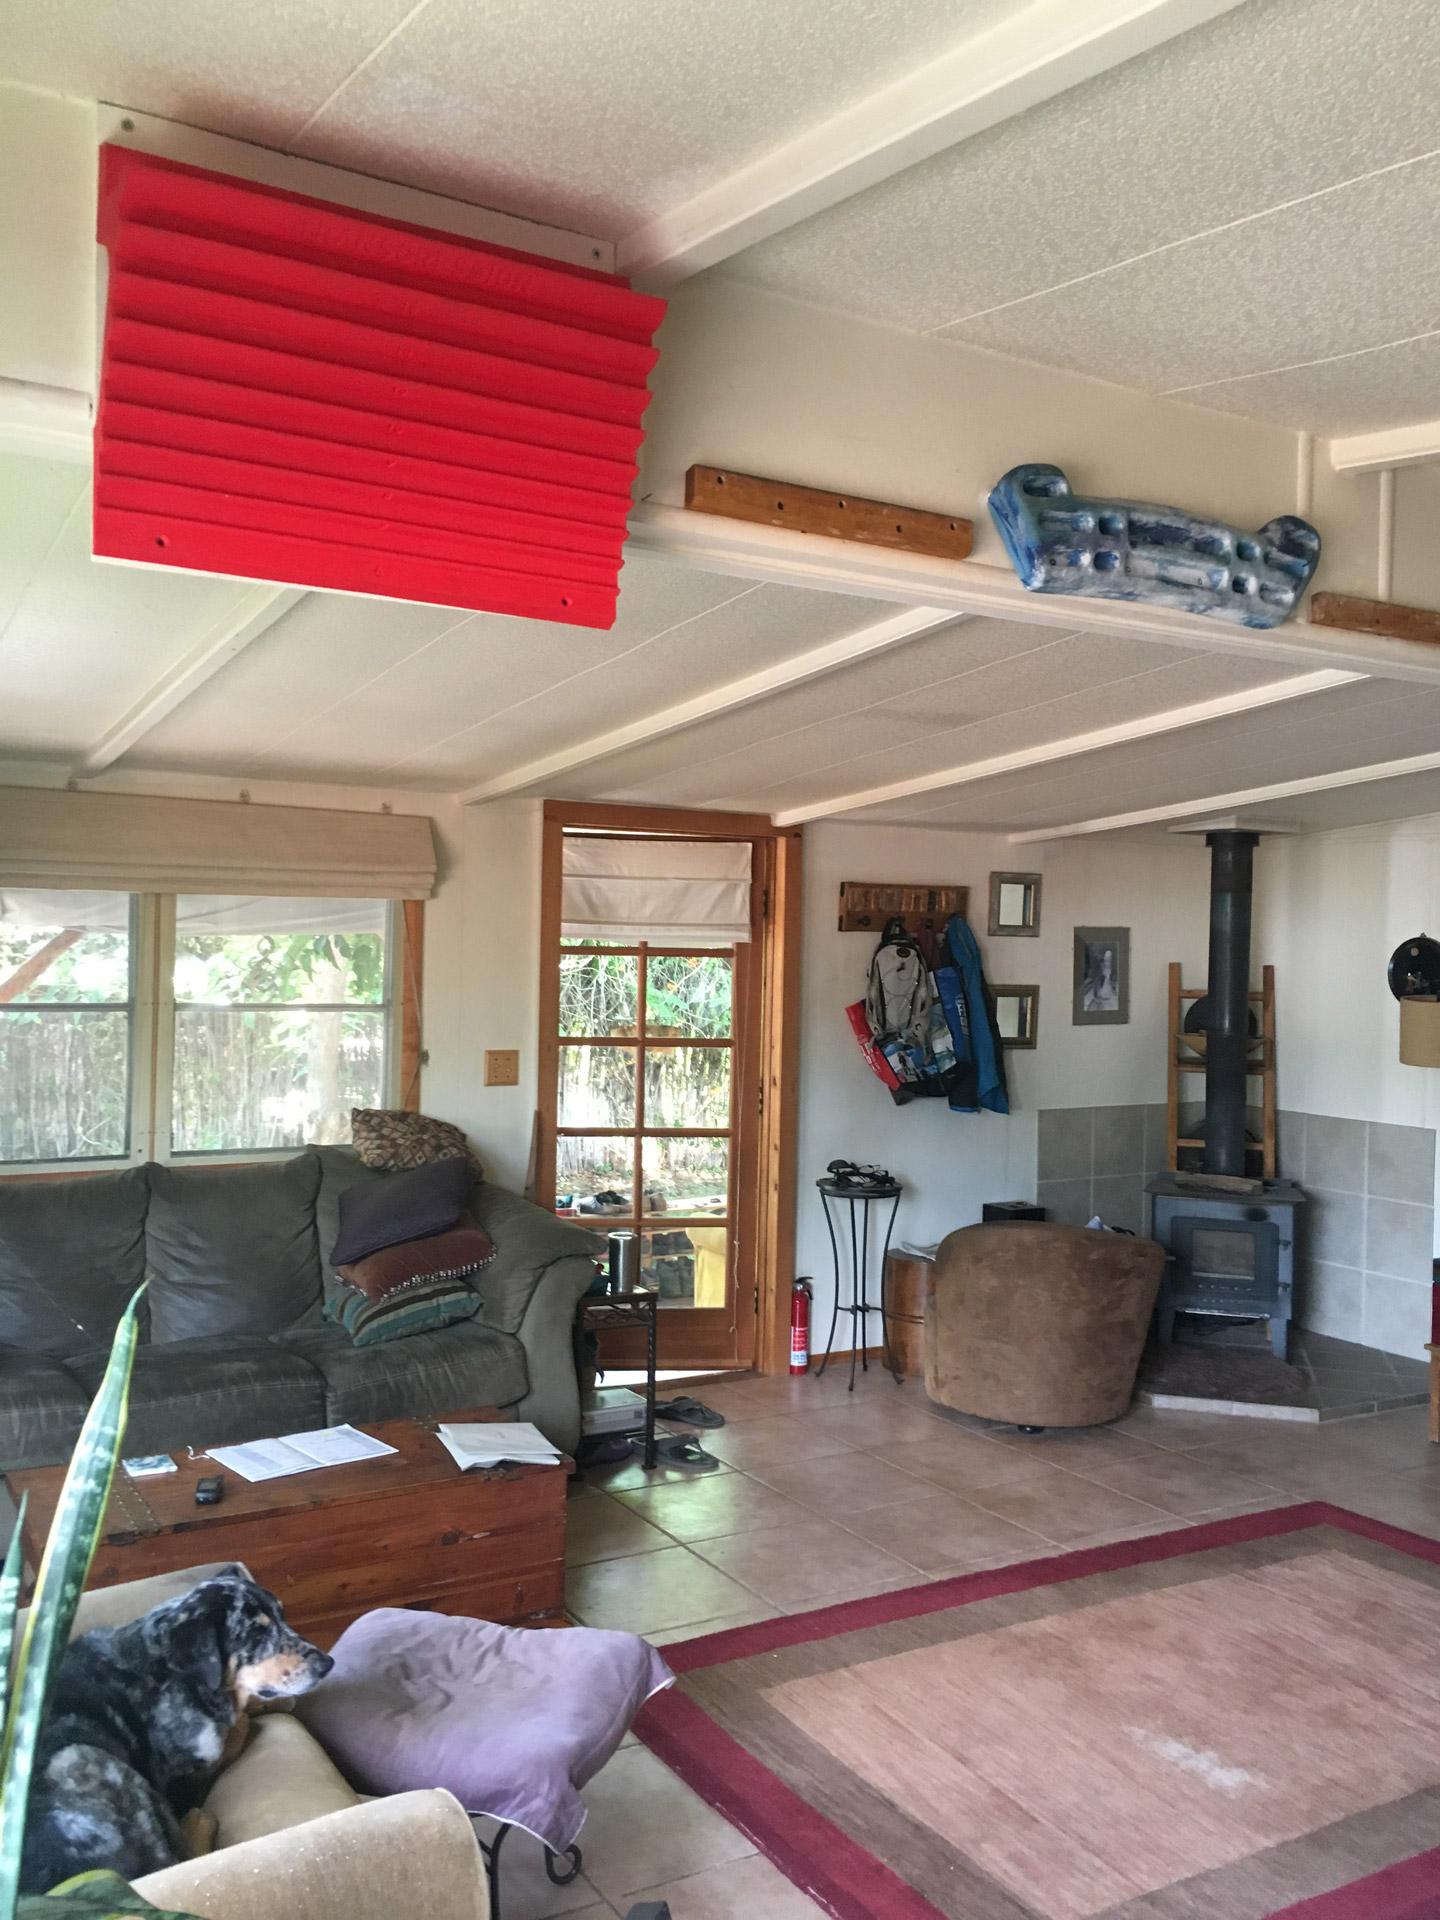 eva-lopez-transgression-hangboard